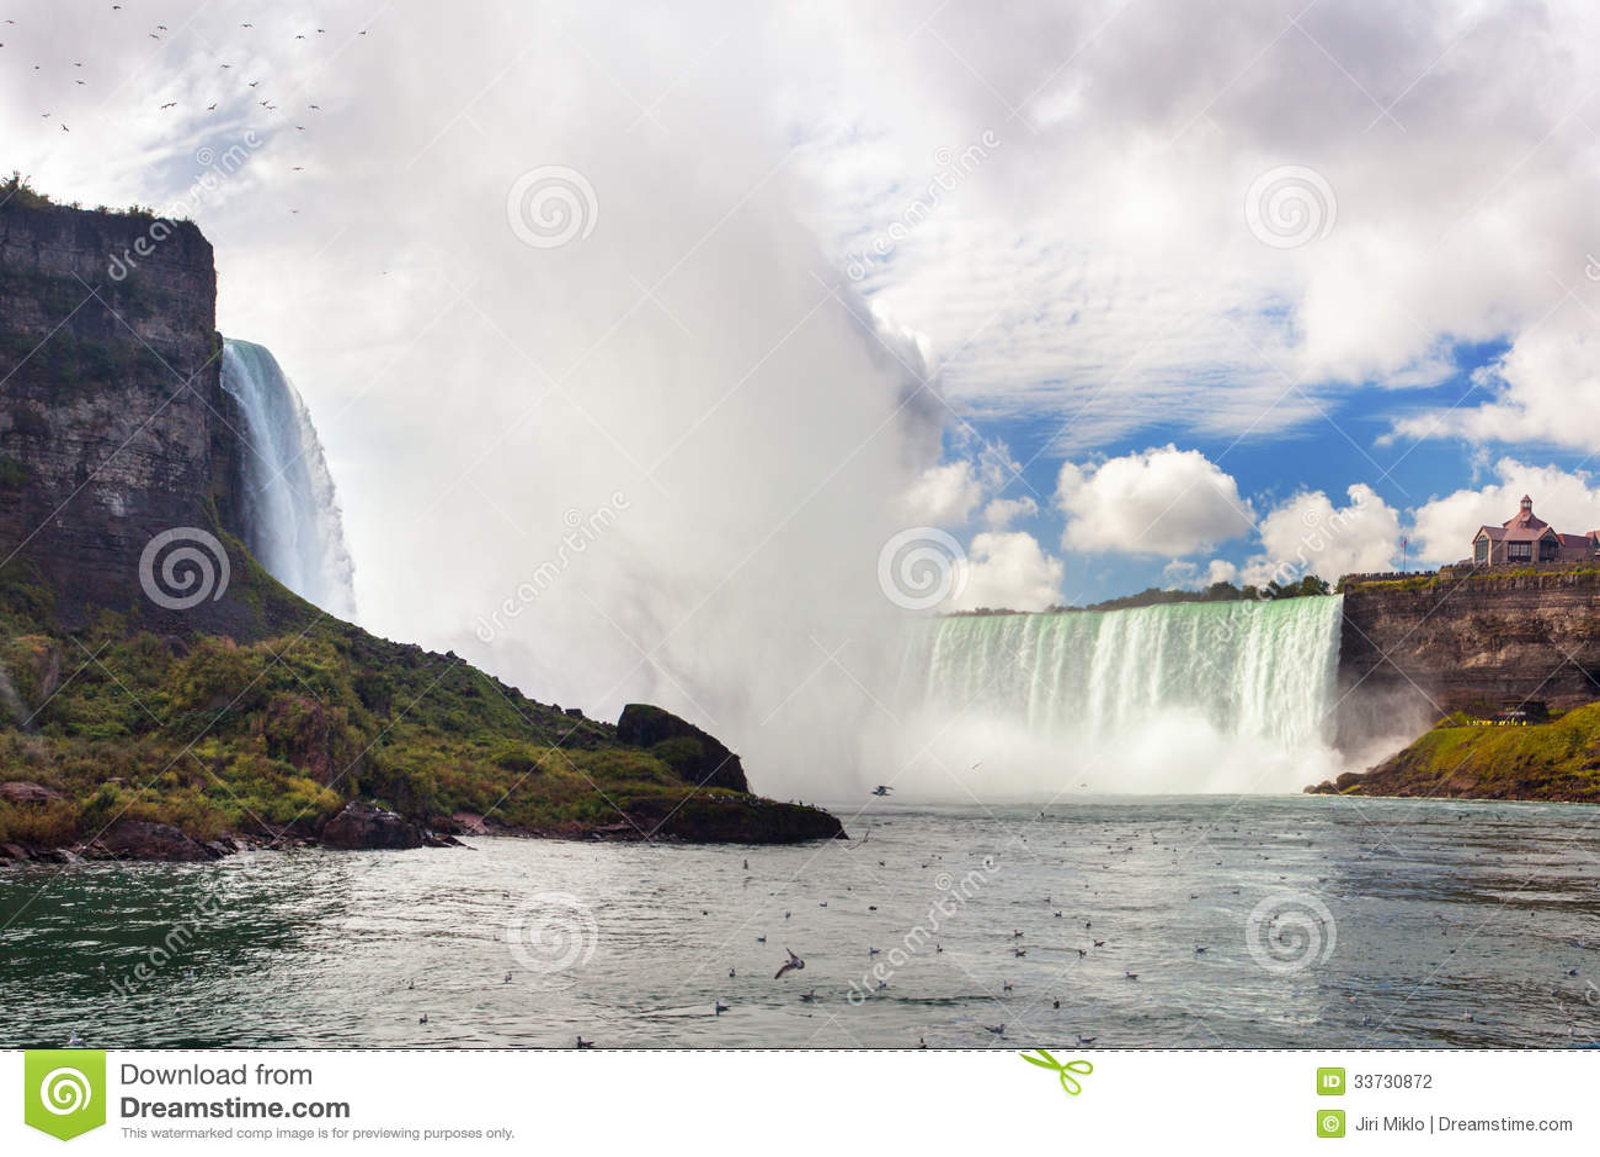 Nice view of Niagara Falls